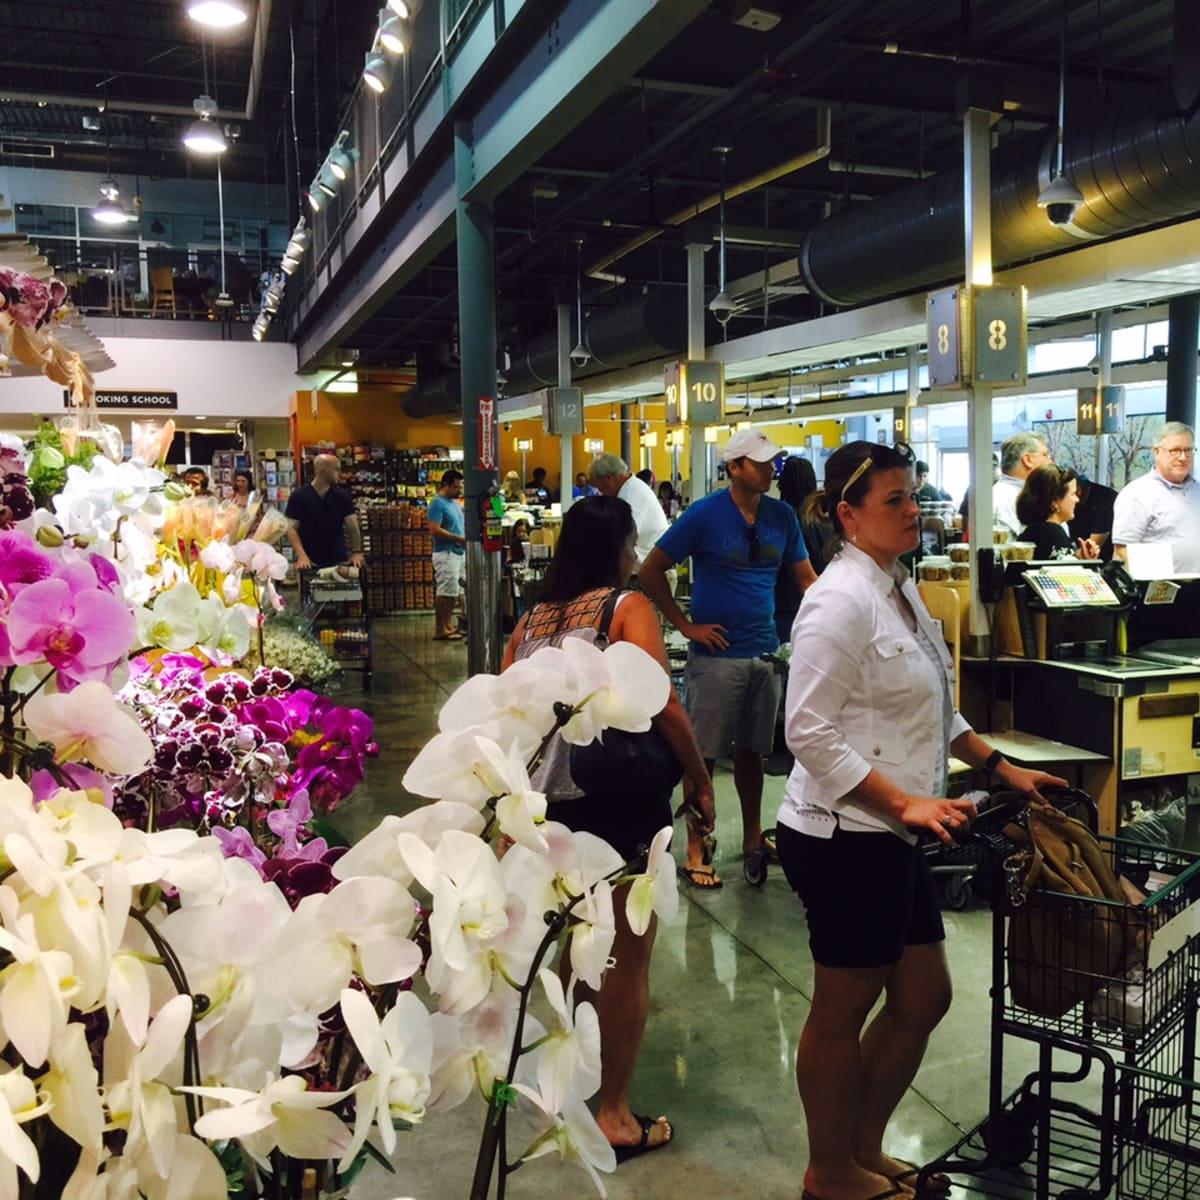 News, Shelby, Central Market, July 2015